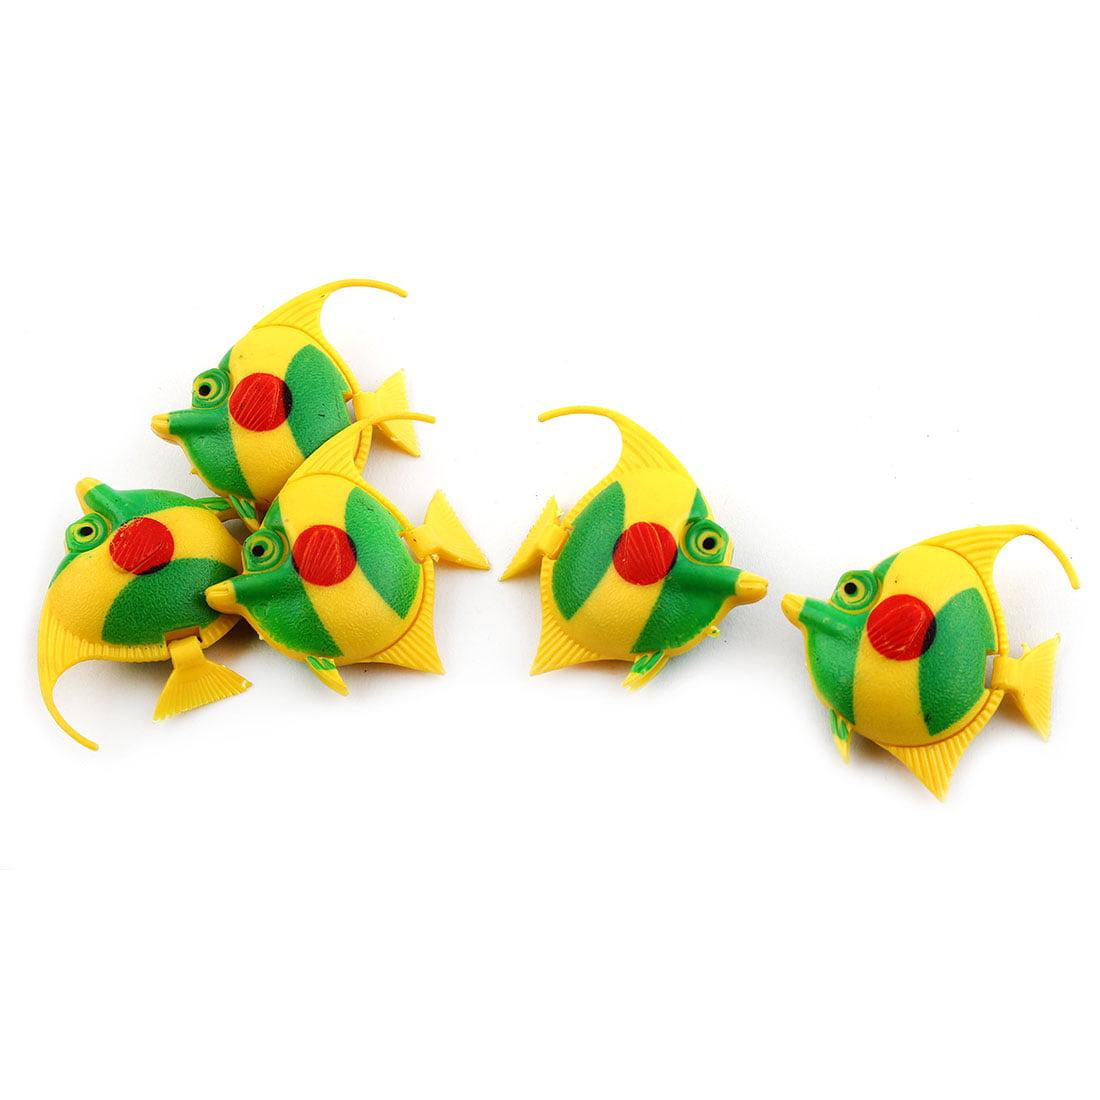 Aquarium Plastic Simulated Floating Tropical Fish Ornaments Green Yellow 5pcs